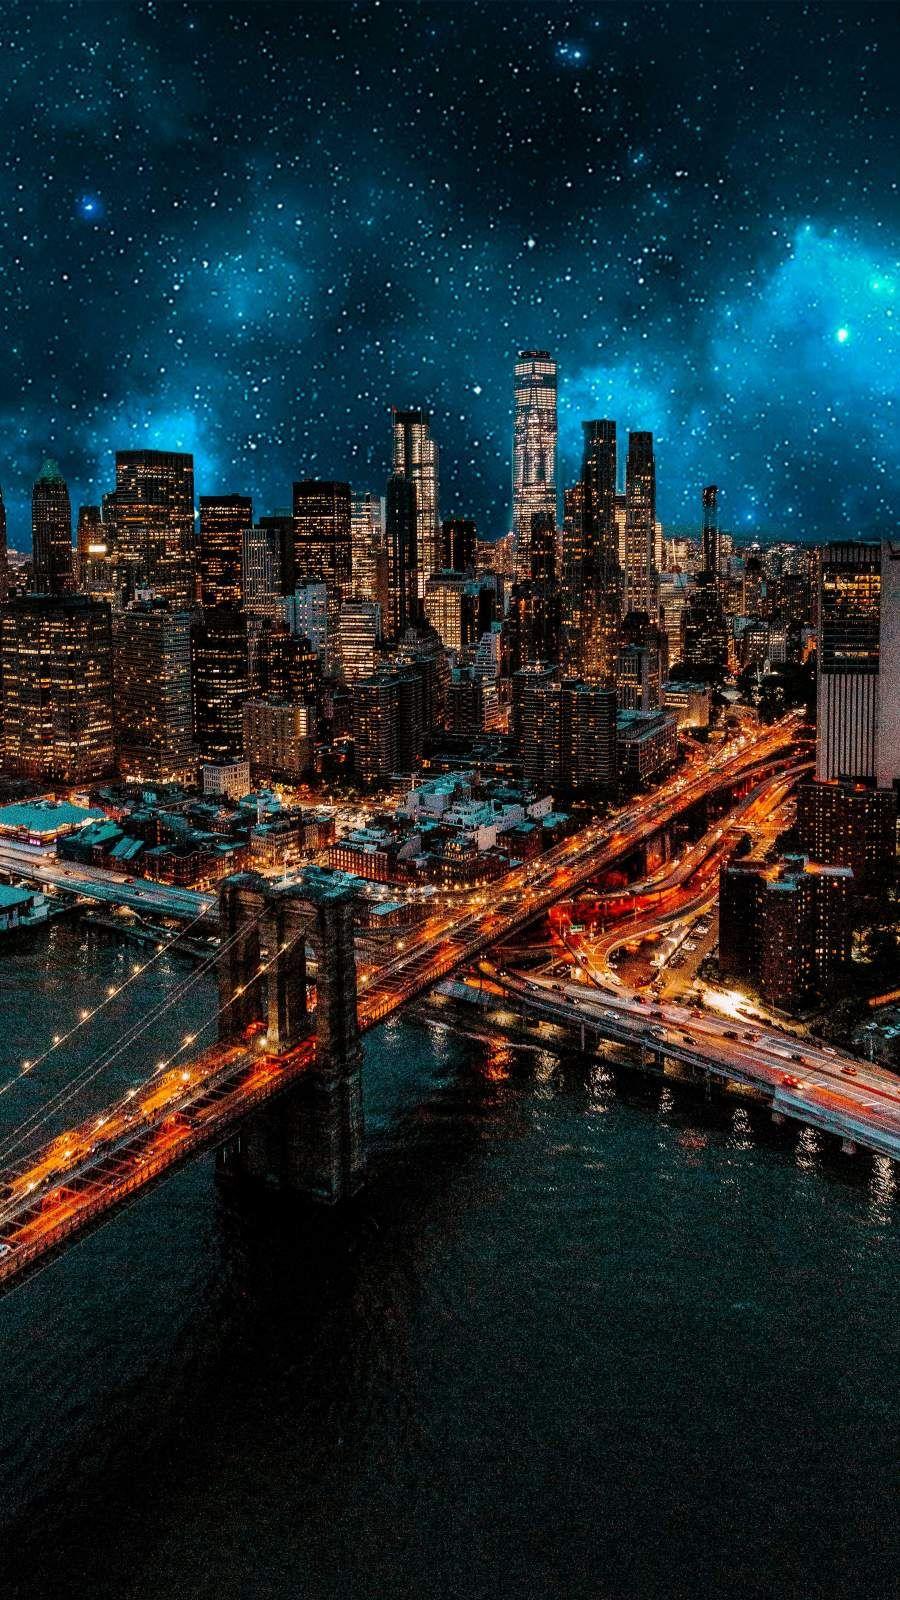 Iphone wallpaper city